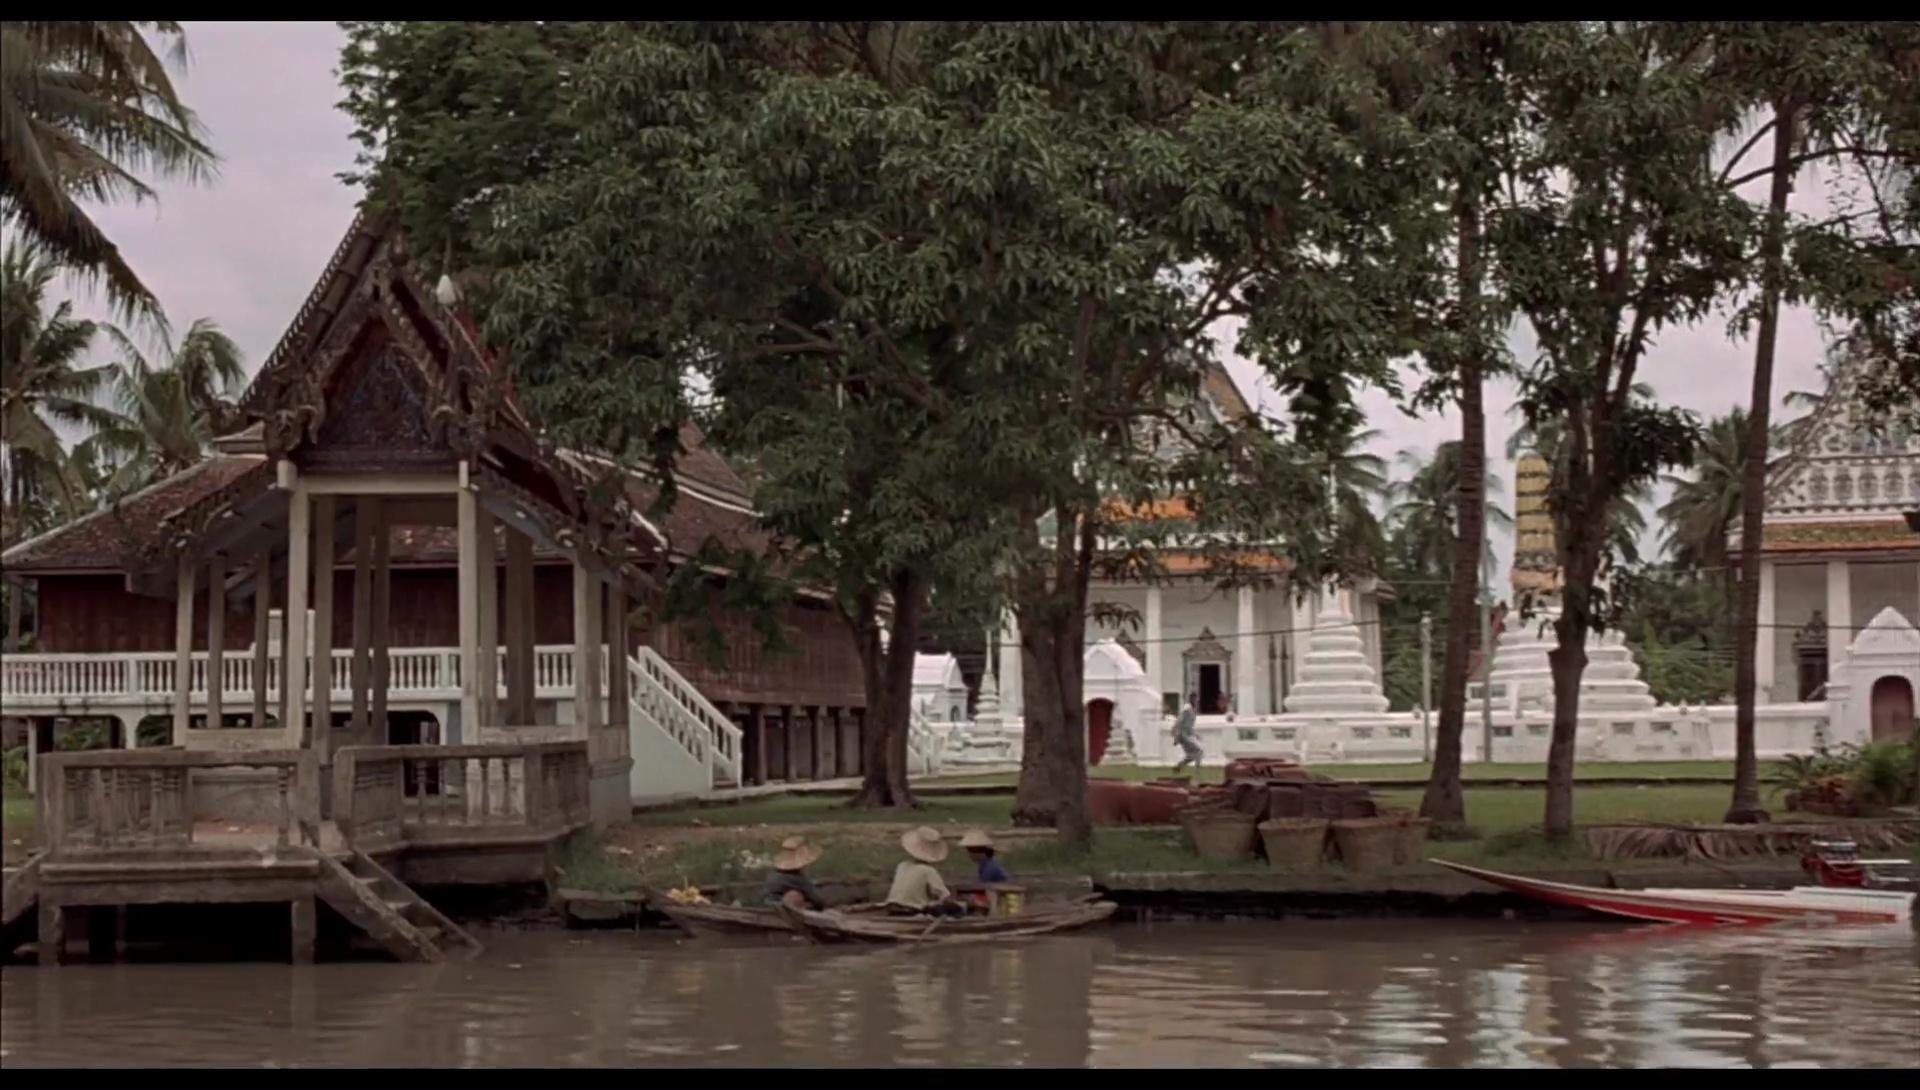 007 El Hombre Del Revolver De Oro 1080p Lat-Cast-Ing 5.1 (1974)